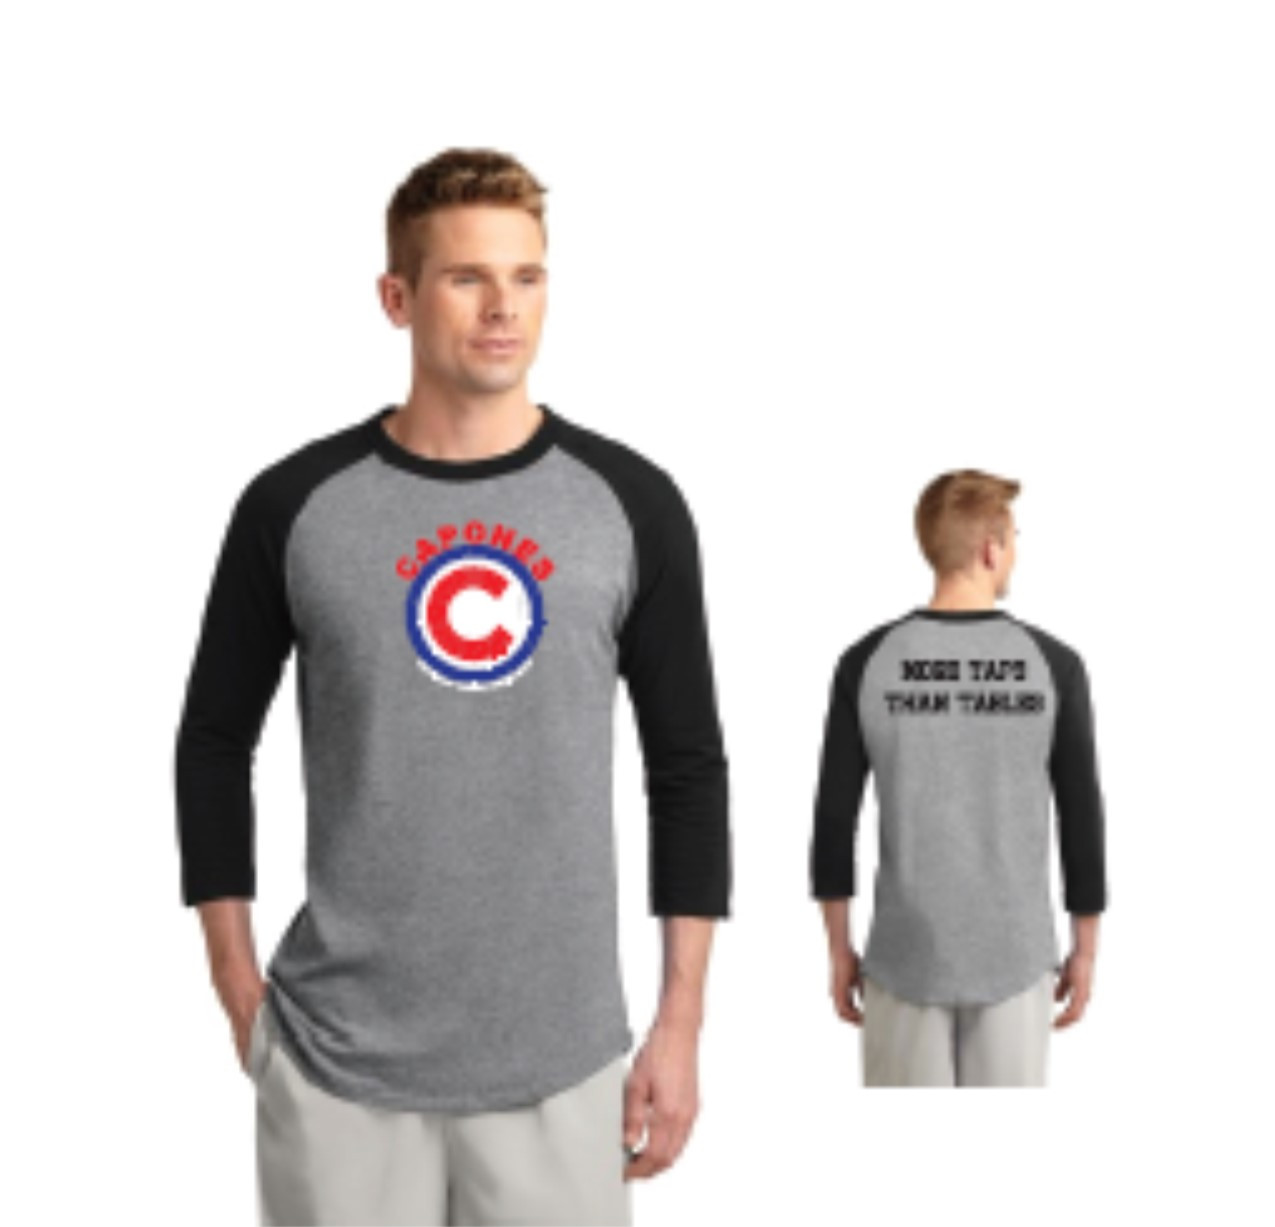 Raglan style shirt